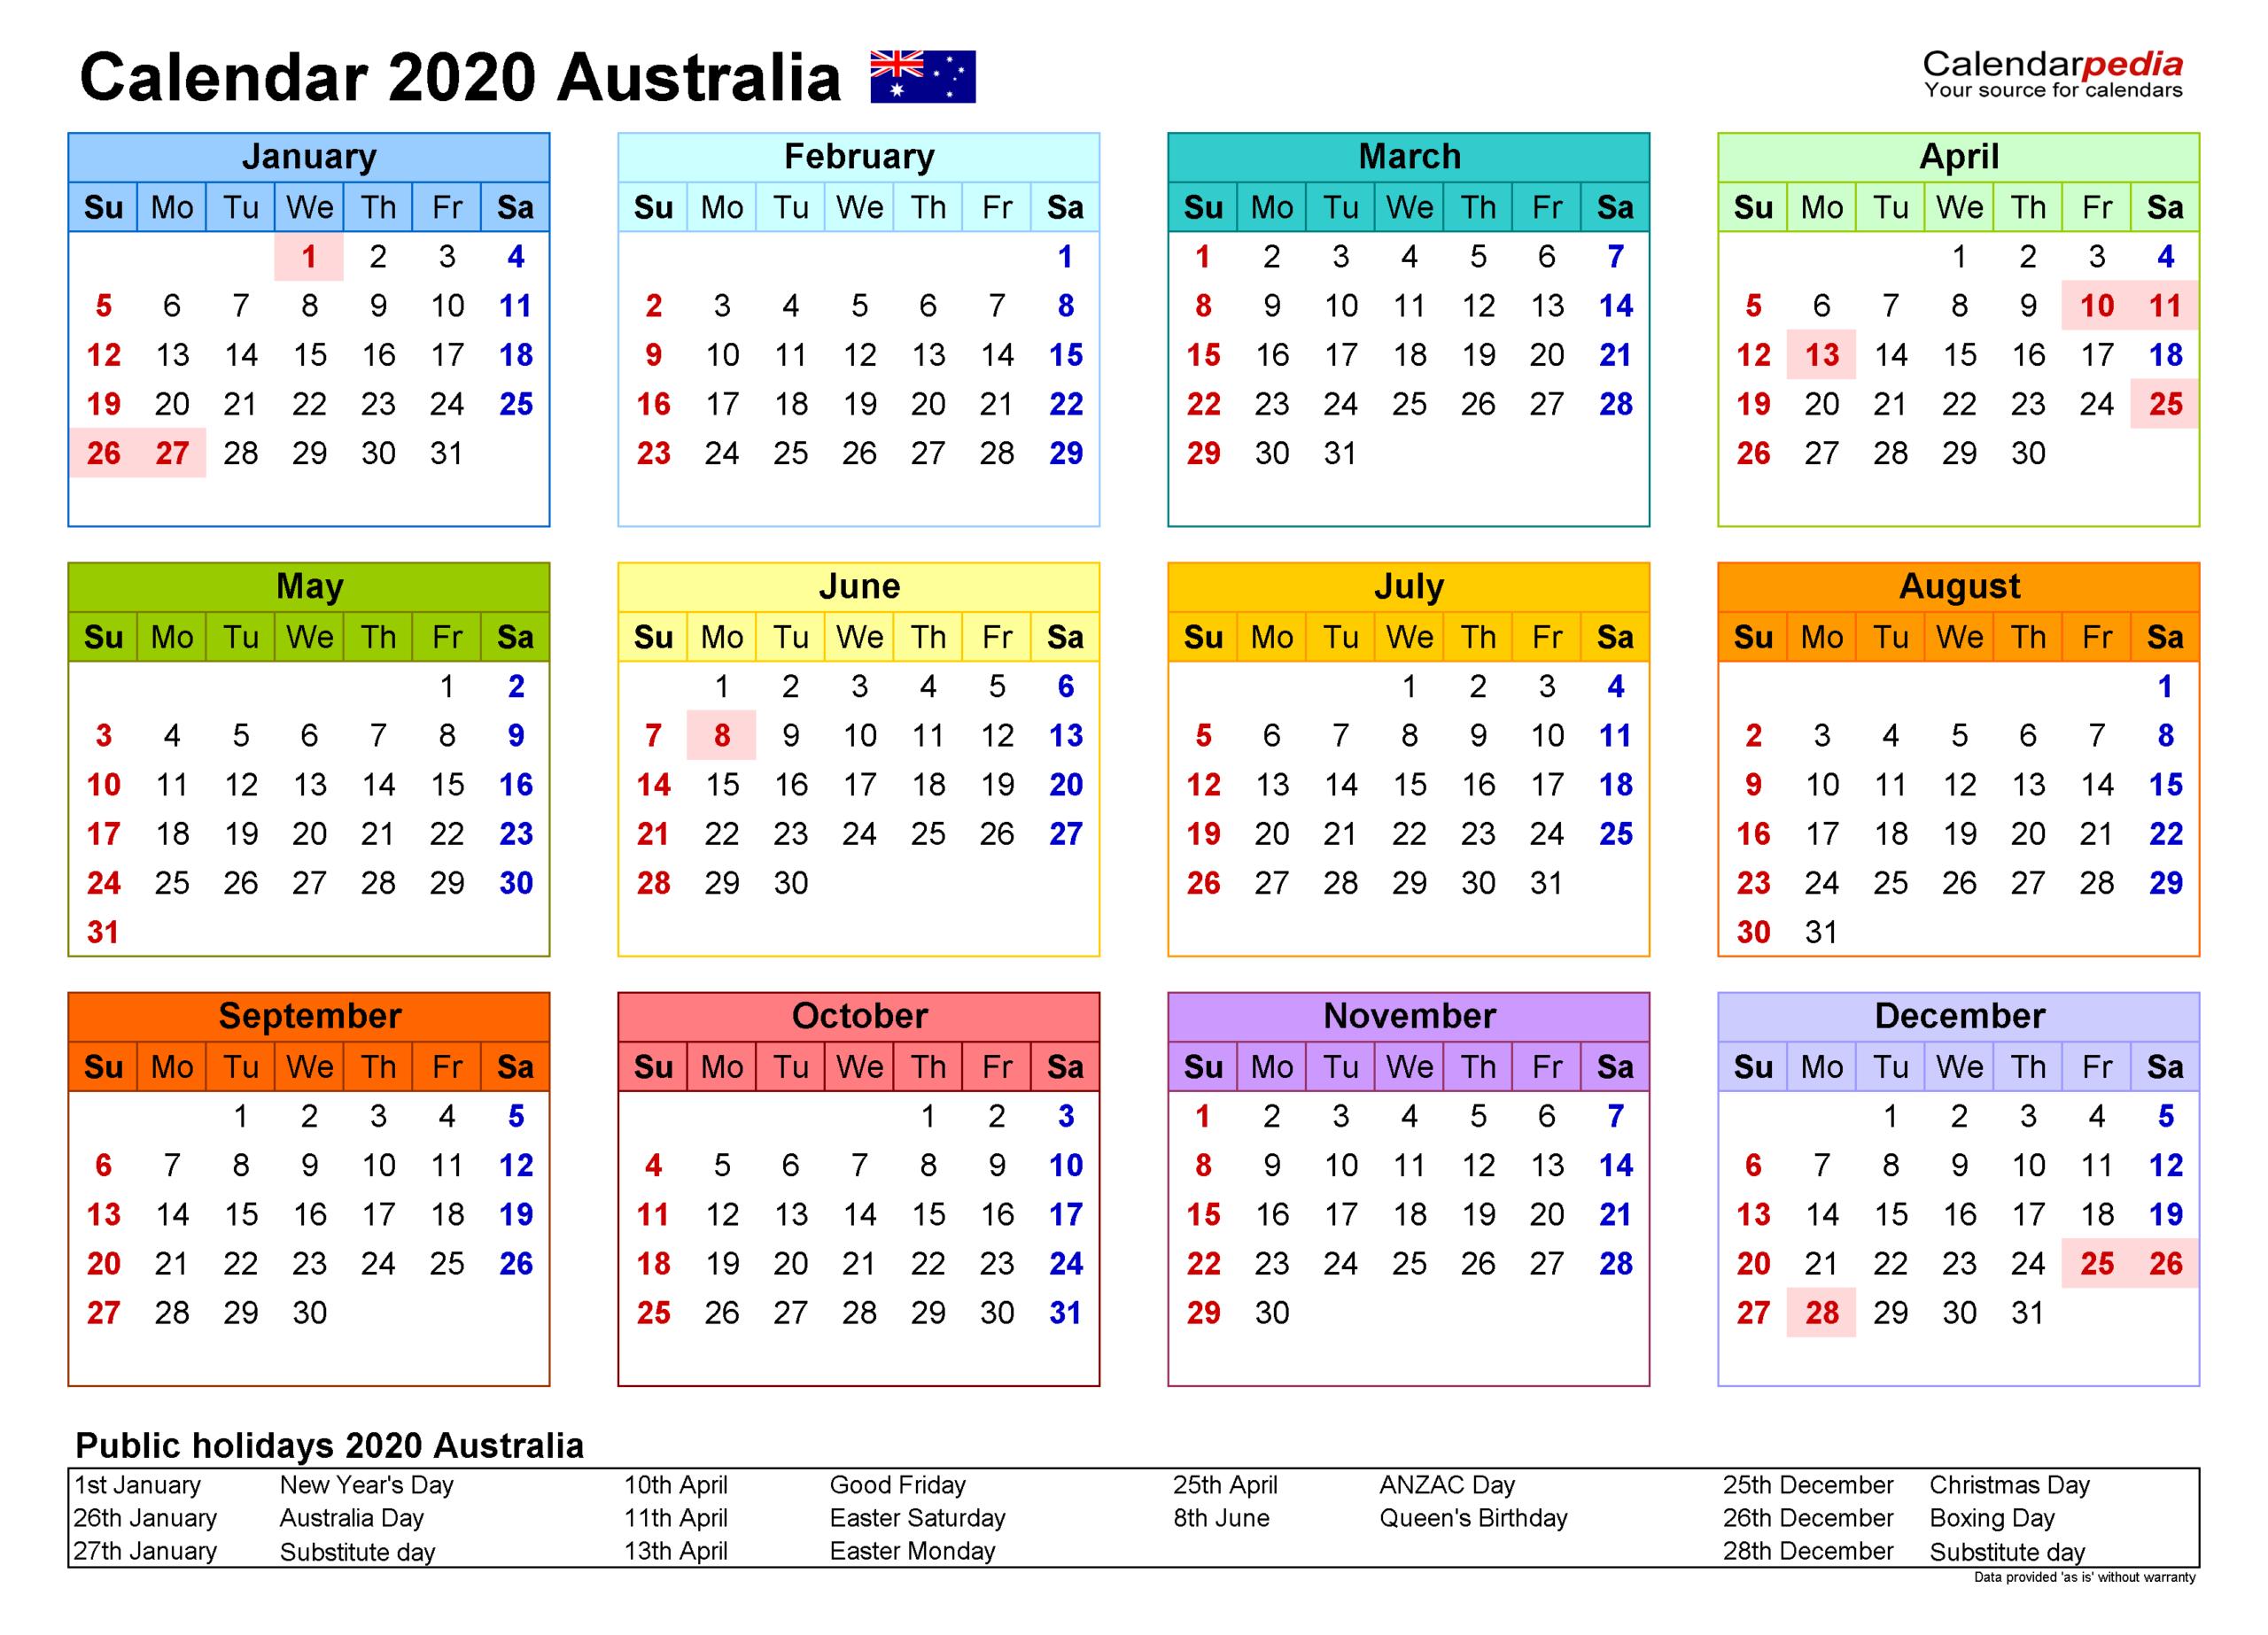 Australia Calendar 2020 - Free Printable Word Templates